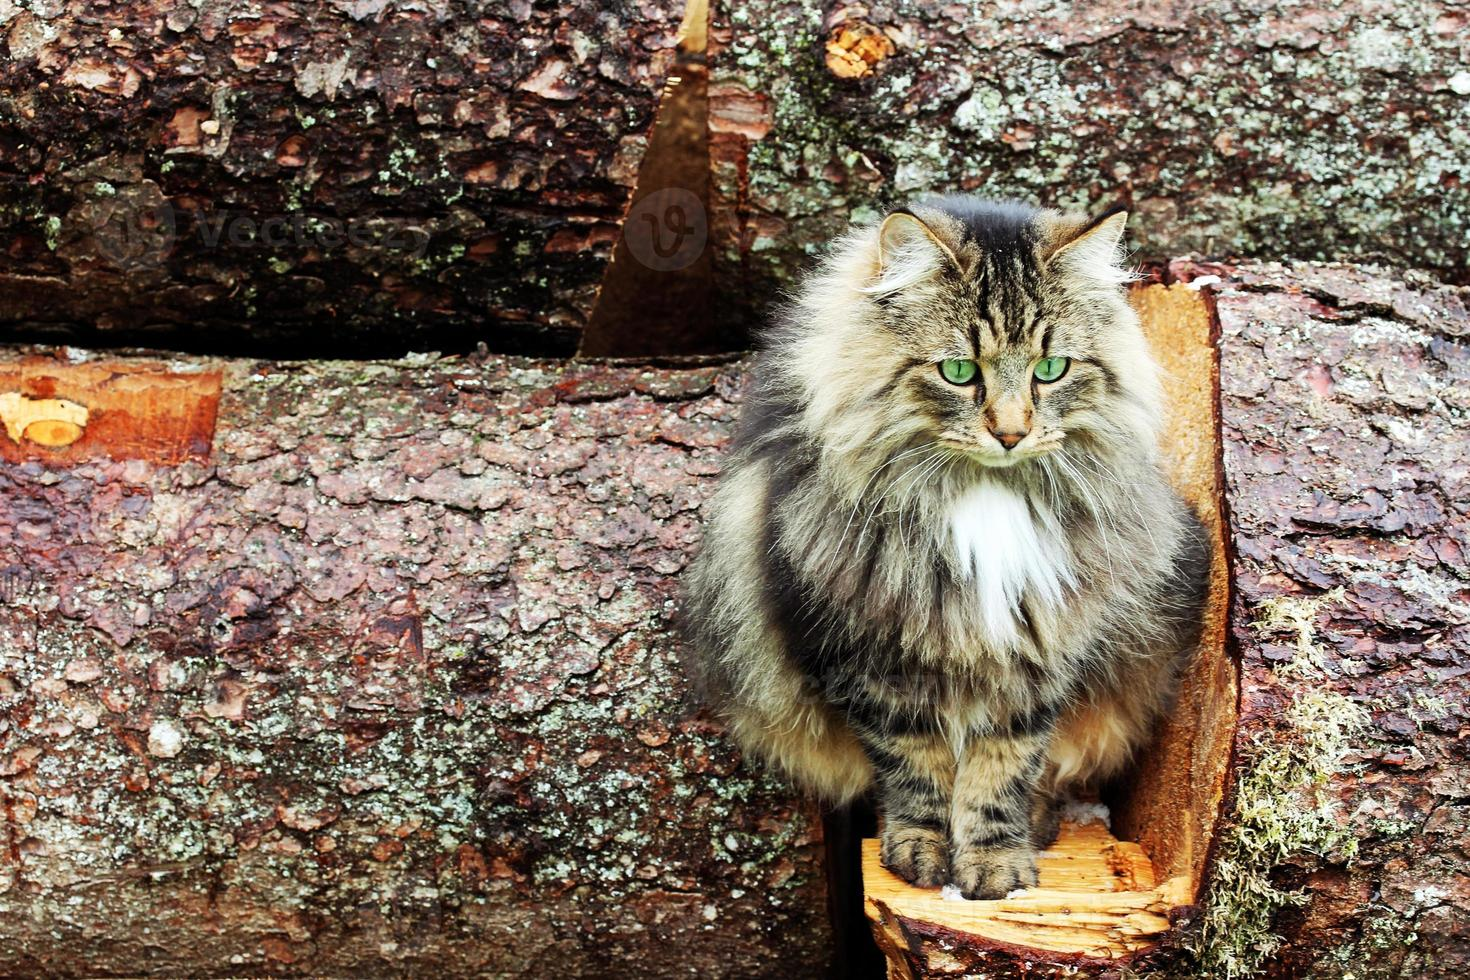 jovem gato norueguês da floresta foto